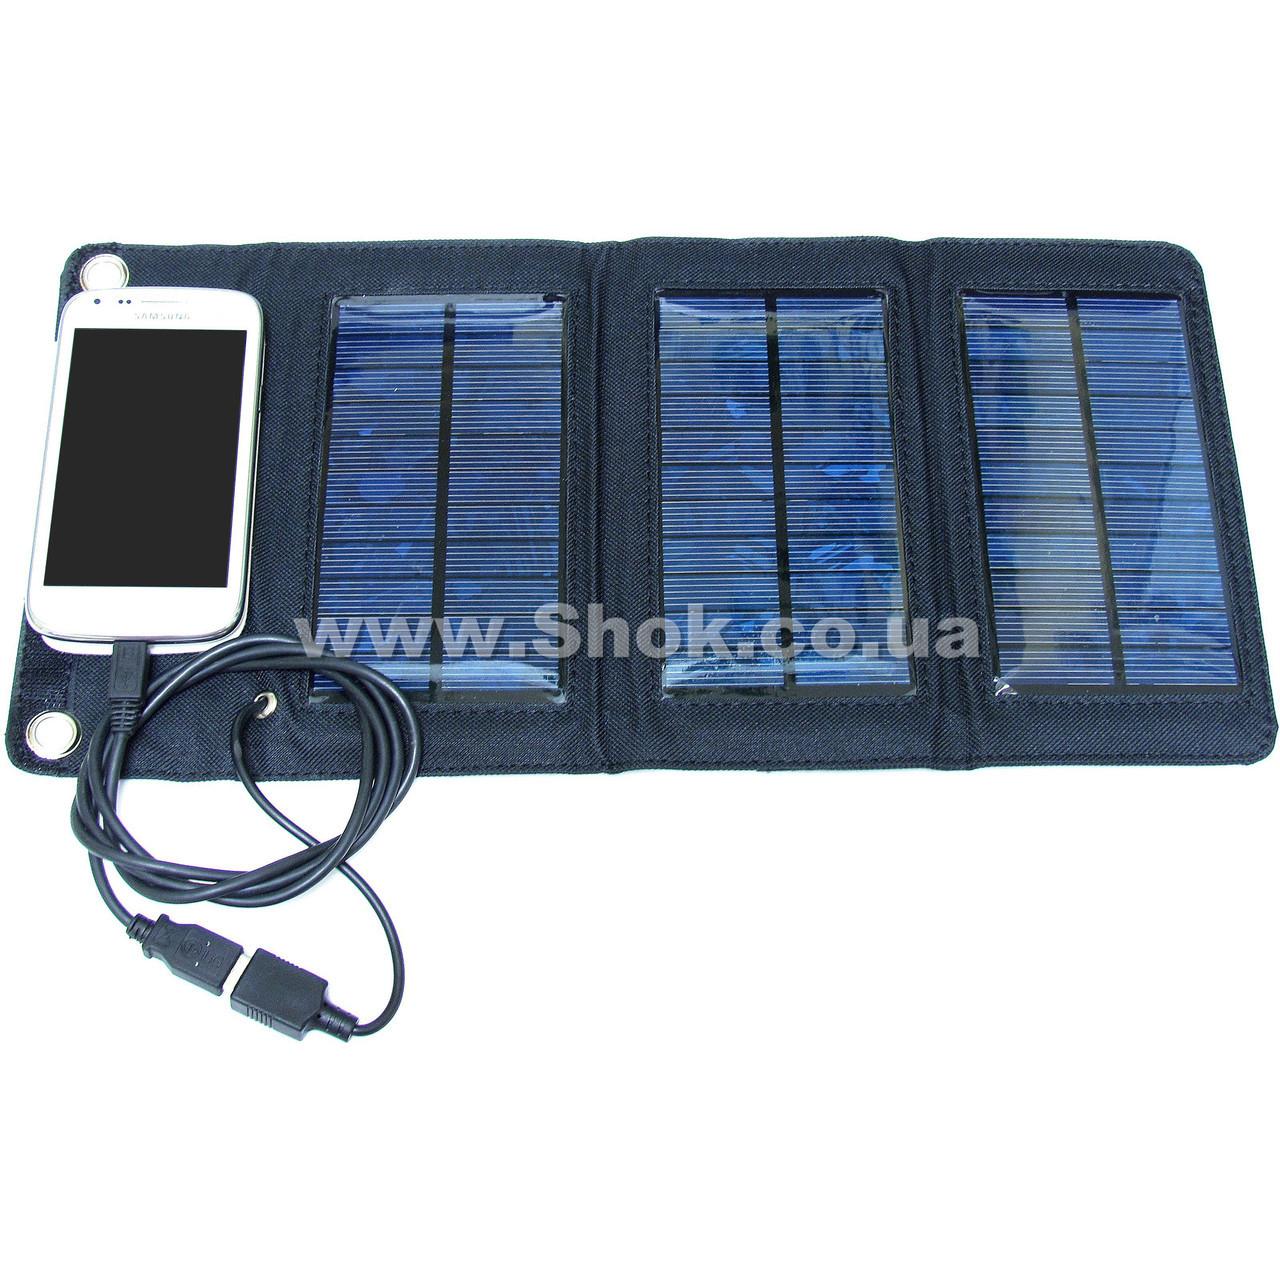 Cолнечное зарядное устройство Solar Power SP-5,5 5W